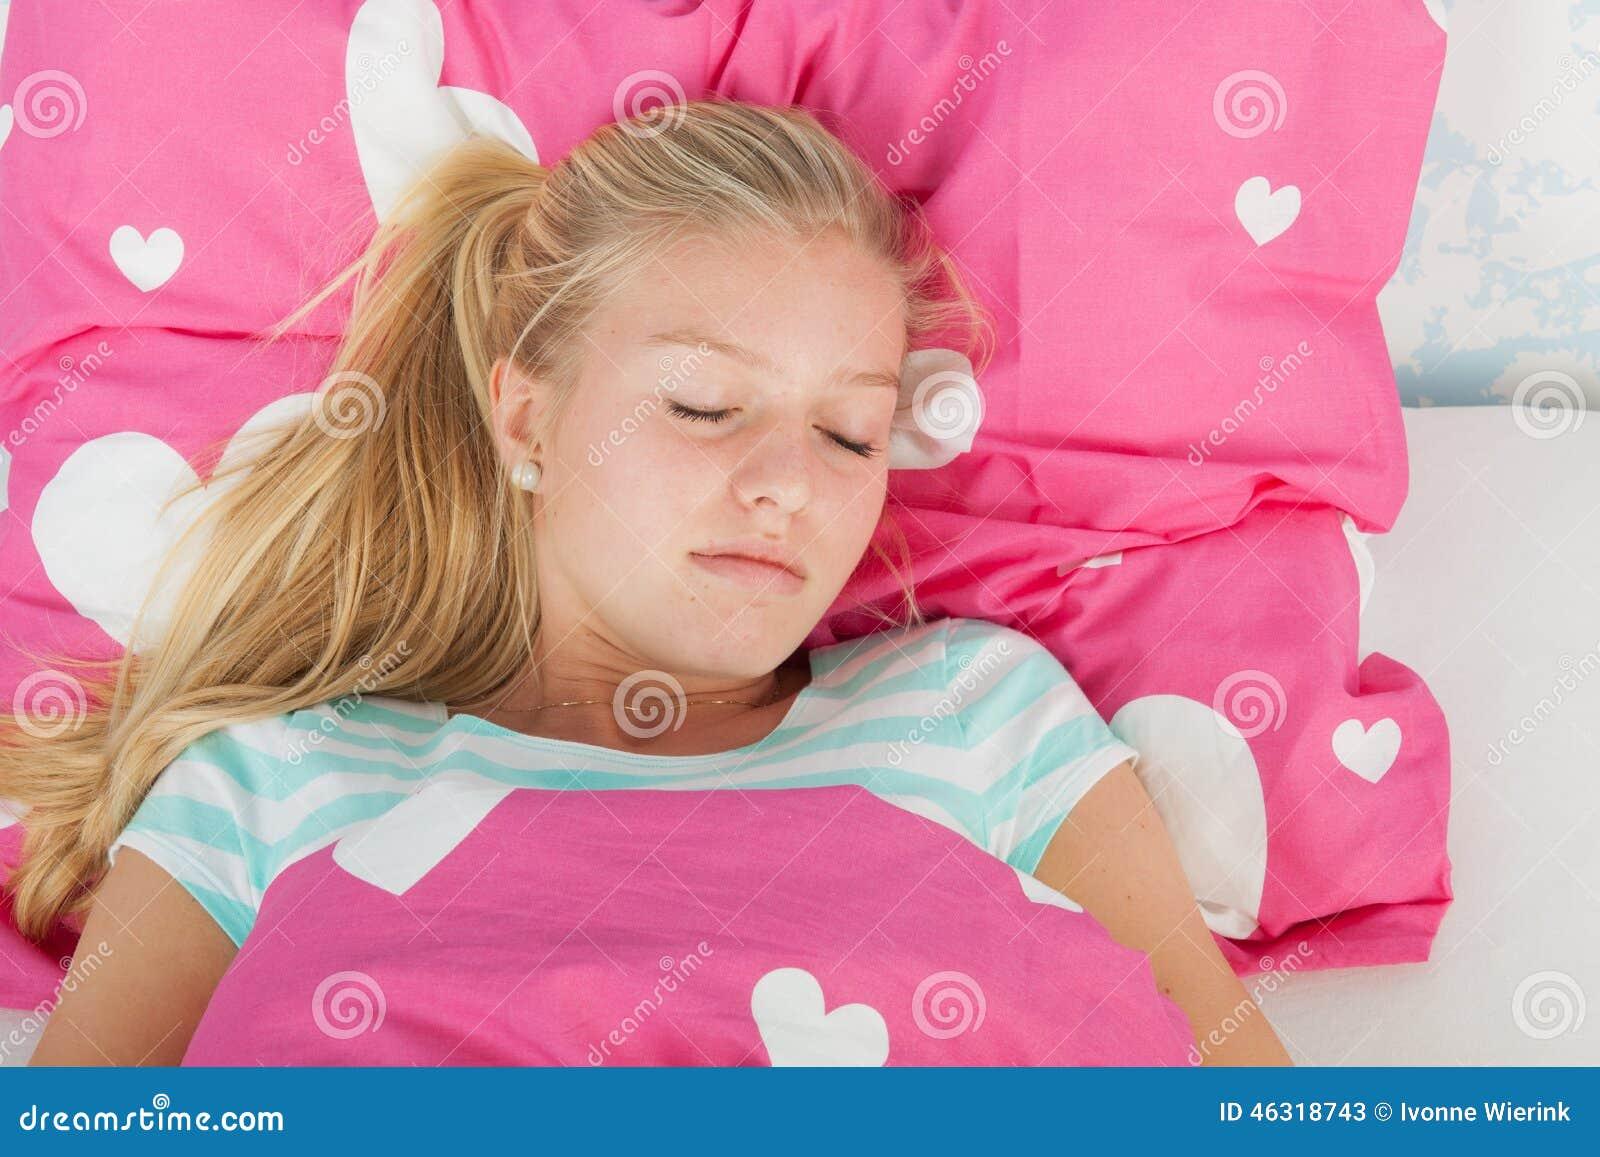 Site Map Sleeping Teen 105